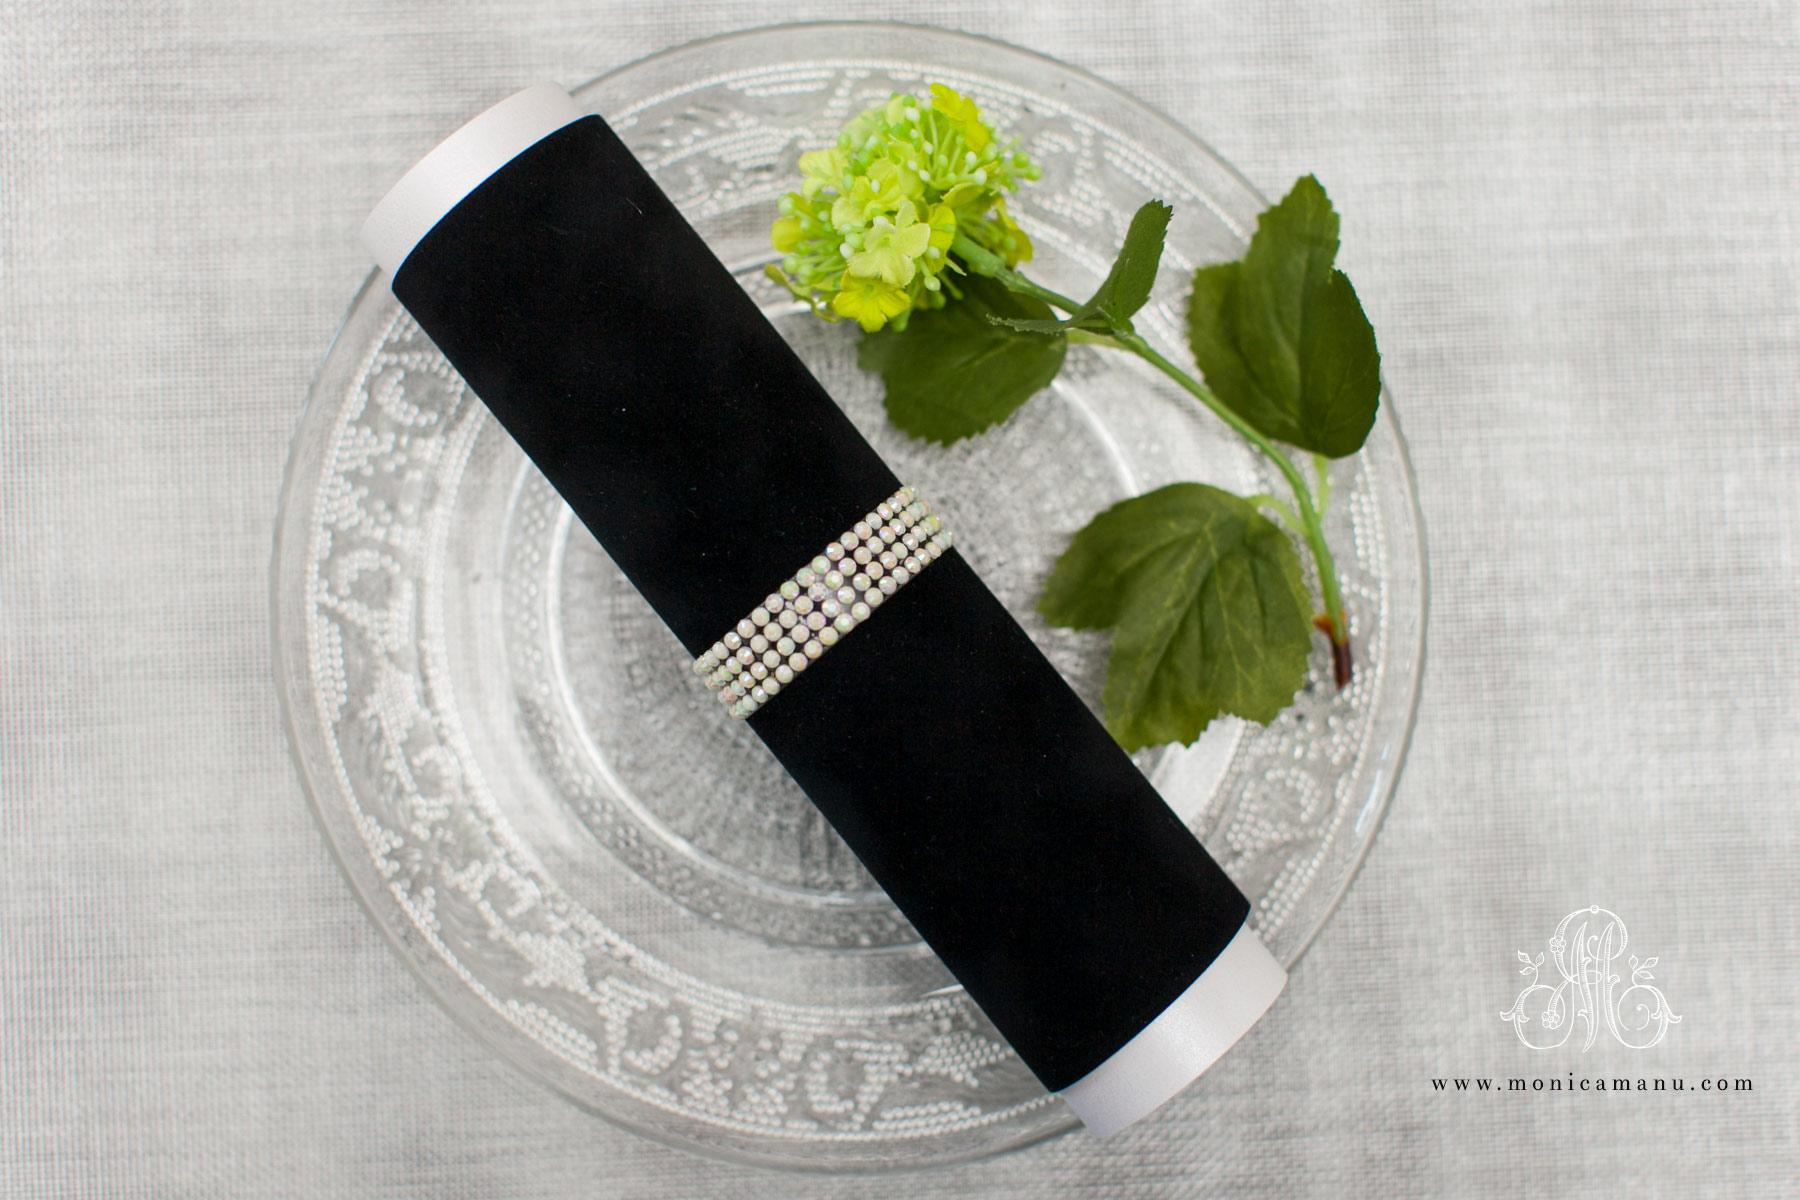 Invitatie Nunta Eleganta Catifea Neagra Monica Manu